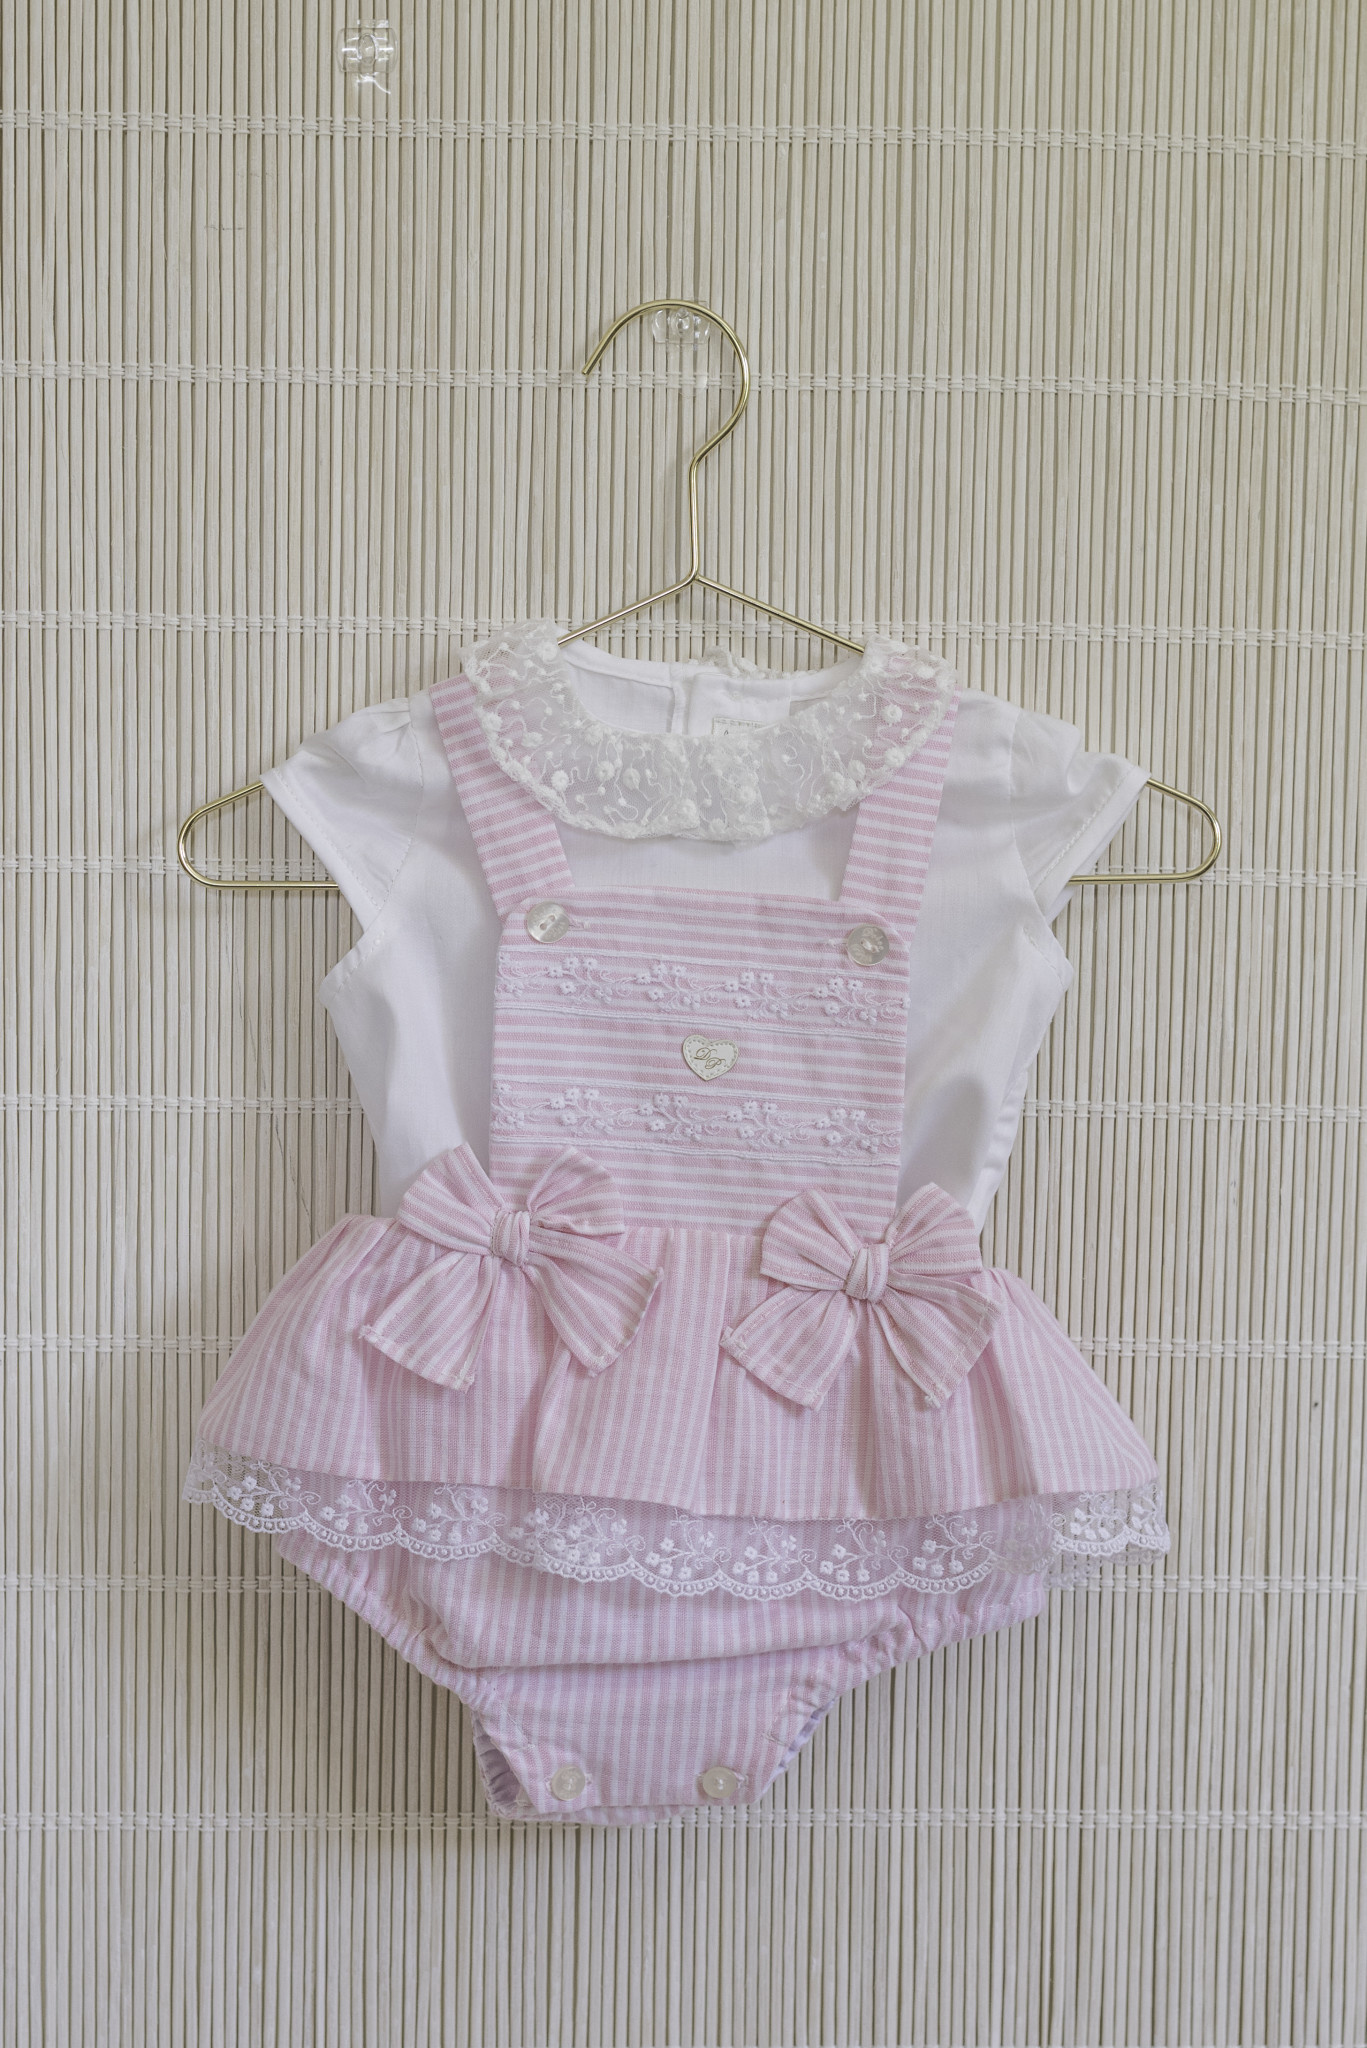 Dolce Petit Dolce Petit SS20 Girls Pink bow jam pant set 2000-23